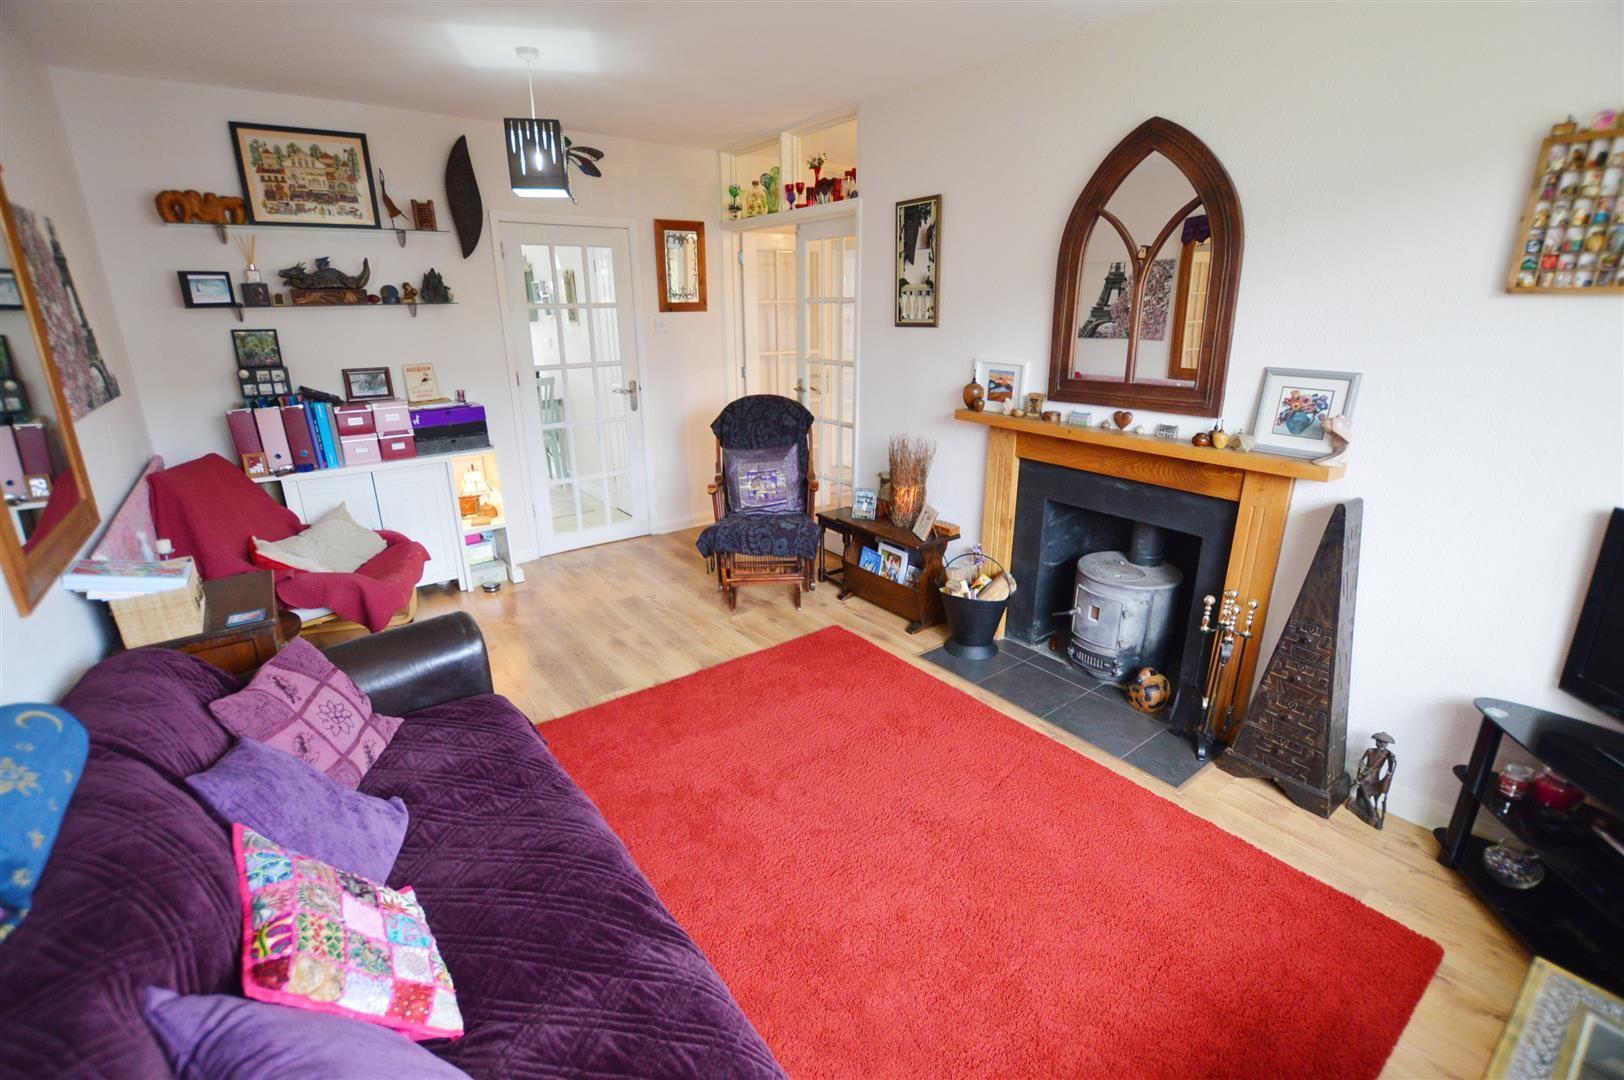 3 bed semi-detached-bungalow for sale in Shobdon 2